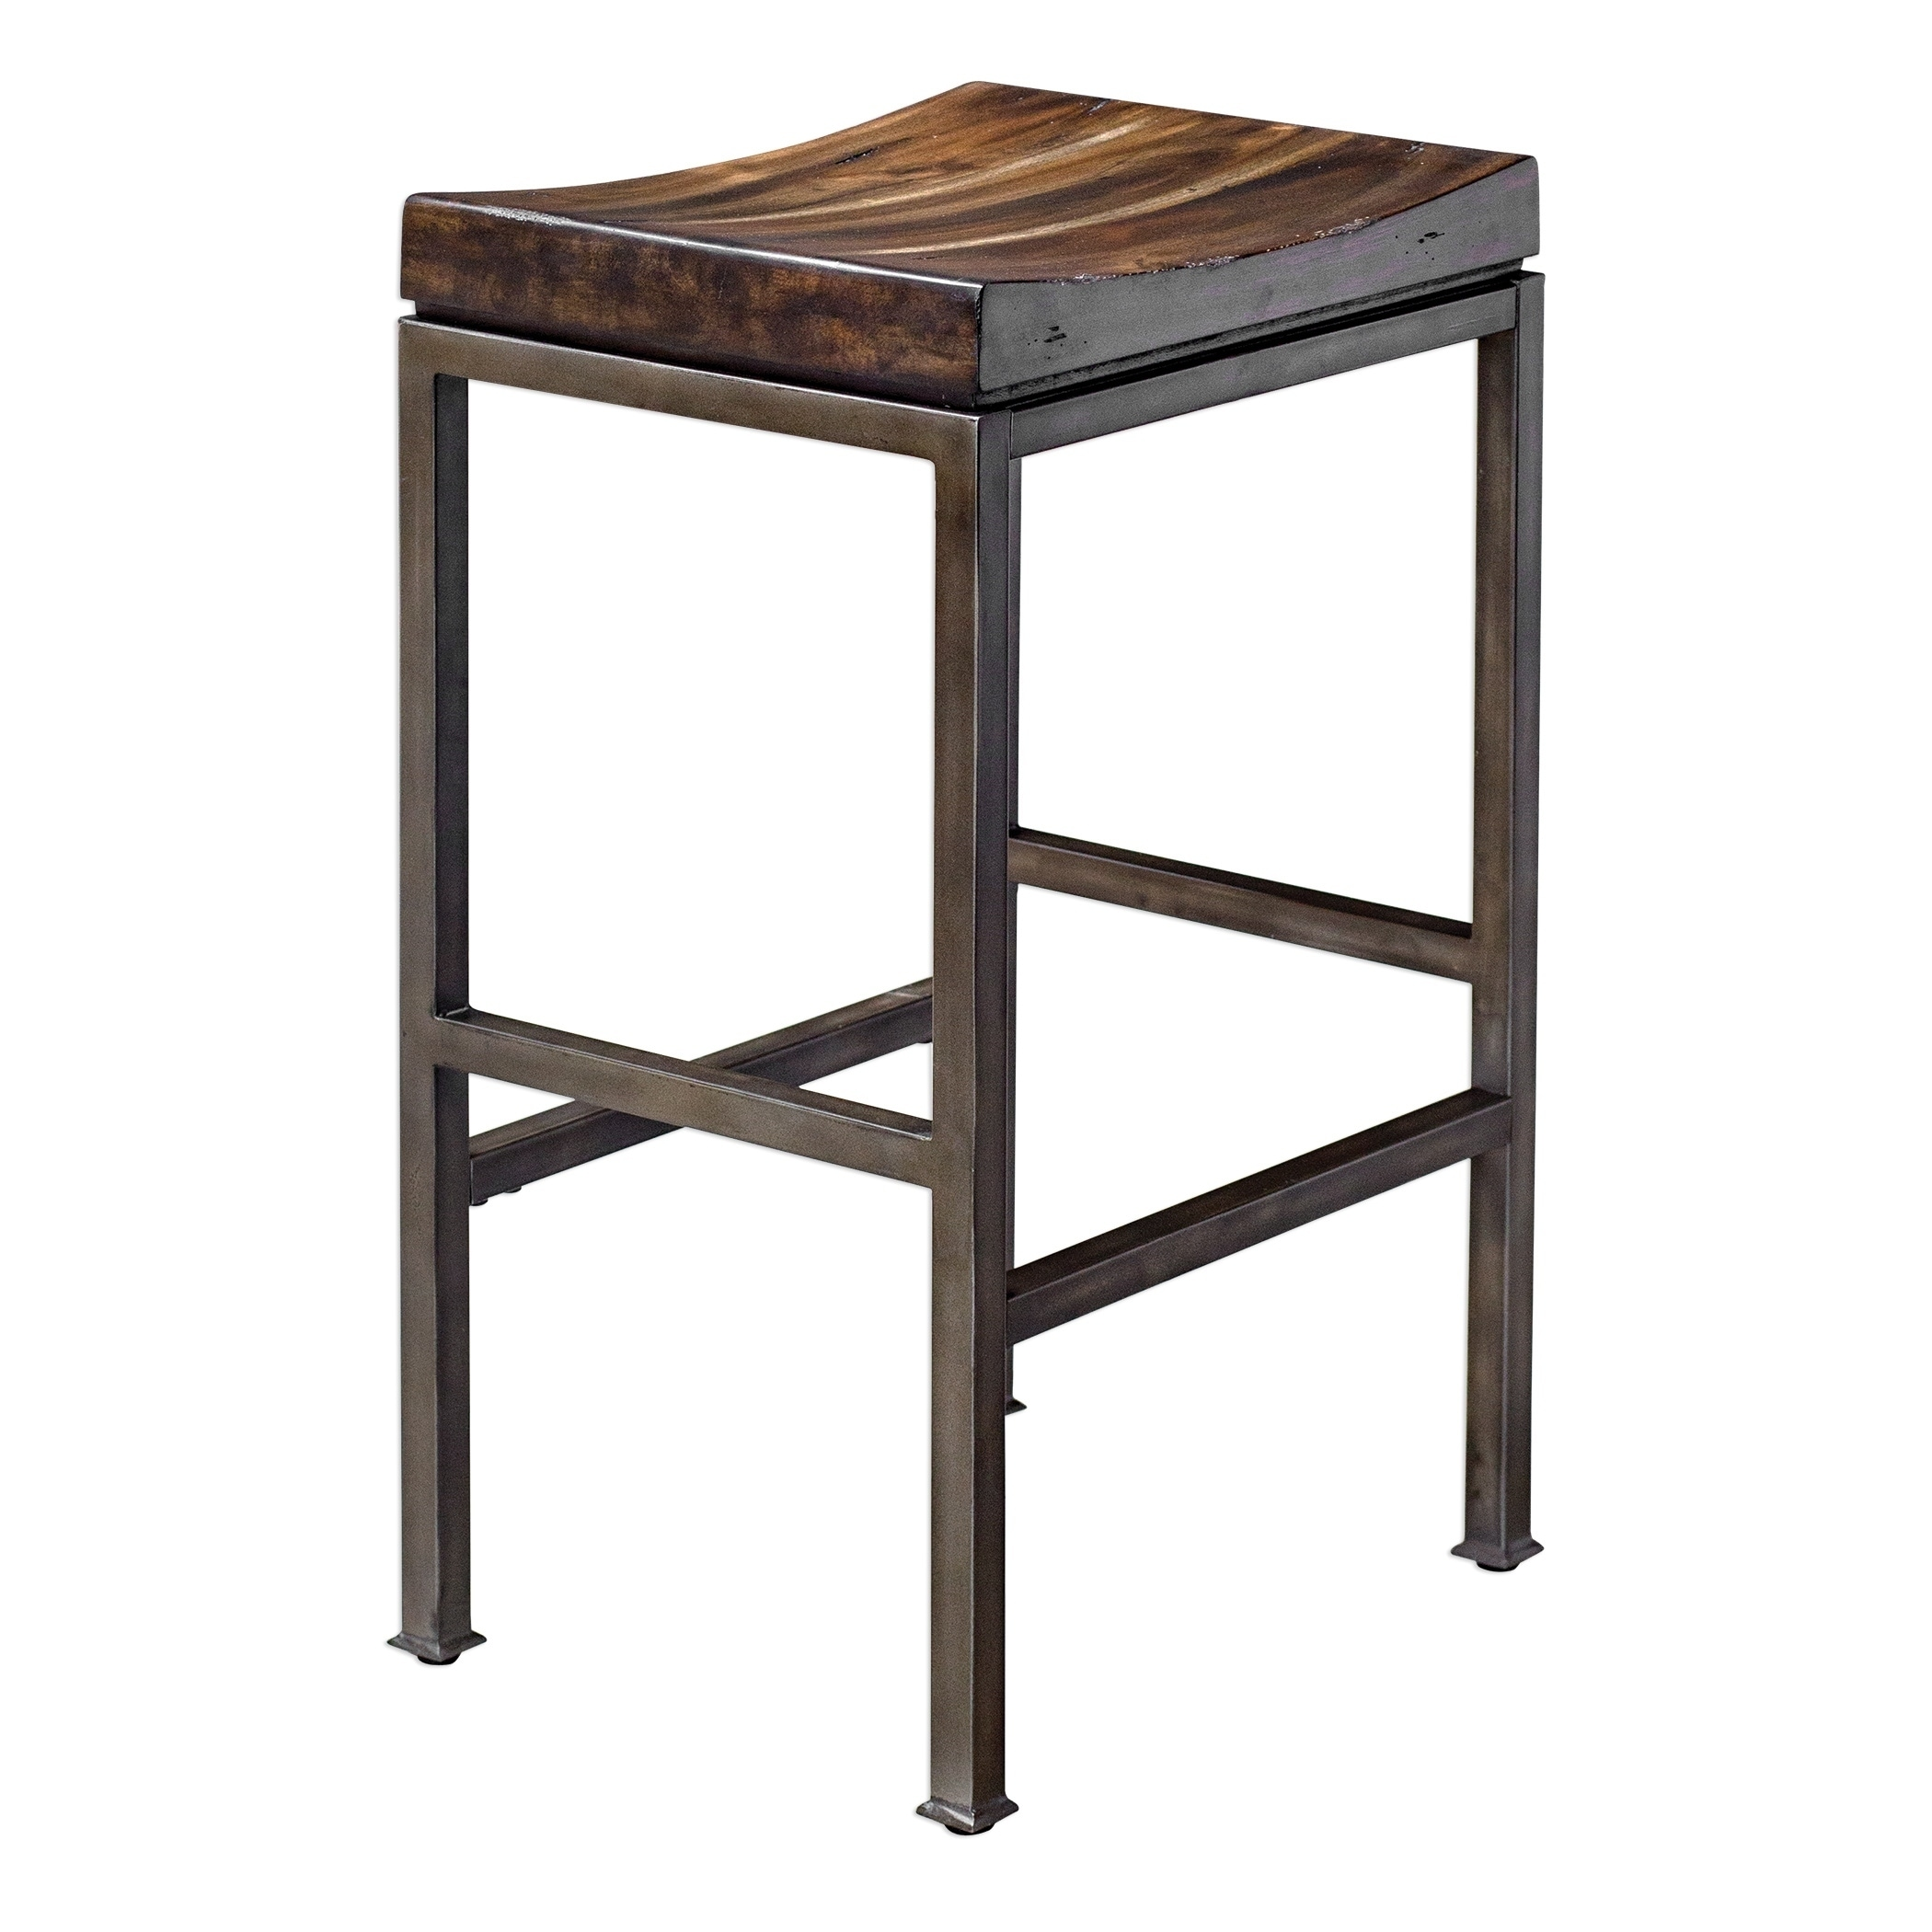 Magnificent Uttermost Beck Dark Walnut Industrial Bar Stool Ibusinesslaw Wood Chair Design Ideas Ibusinesslaworg